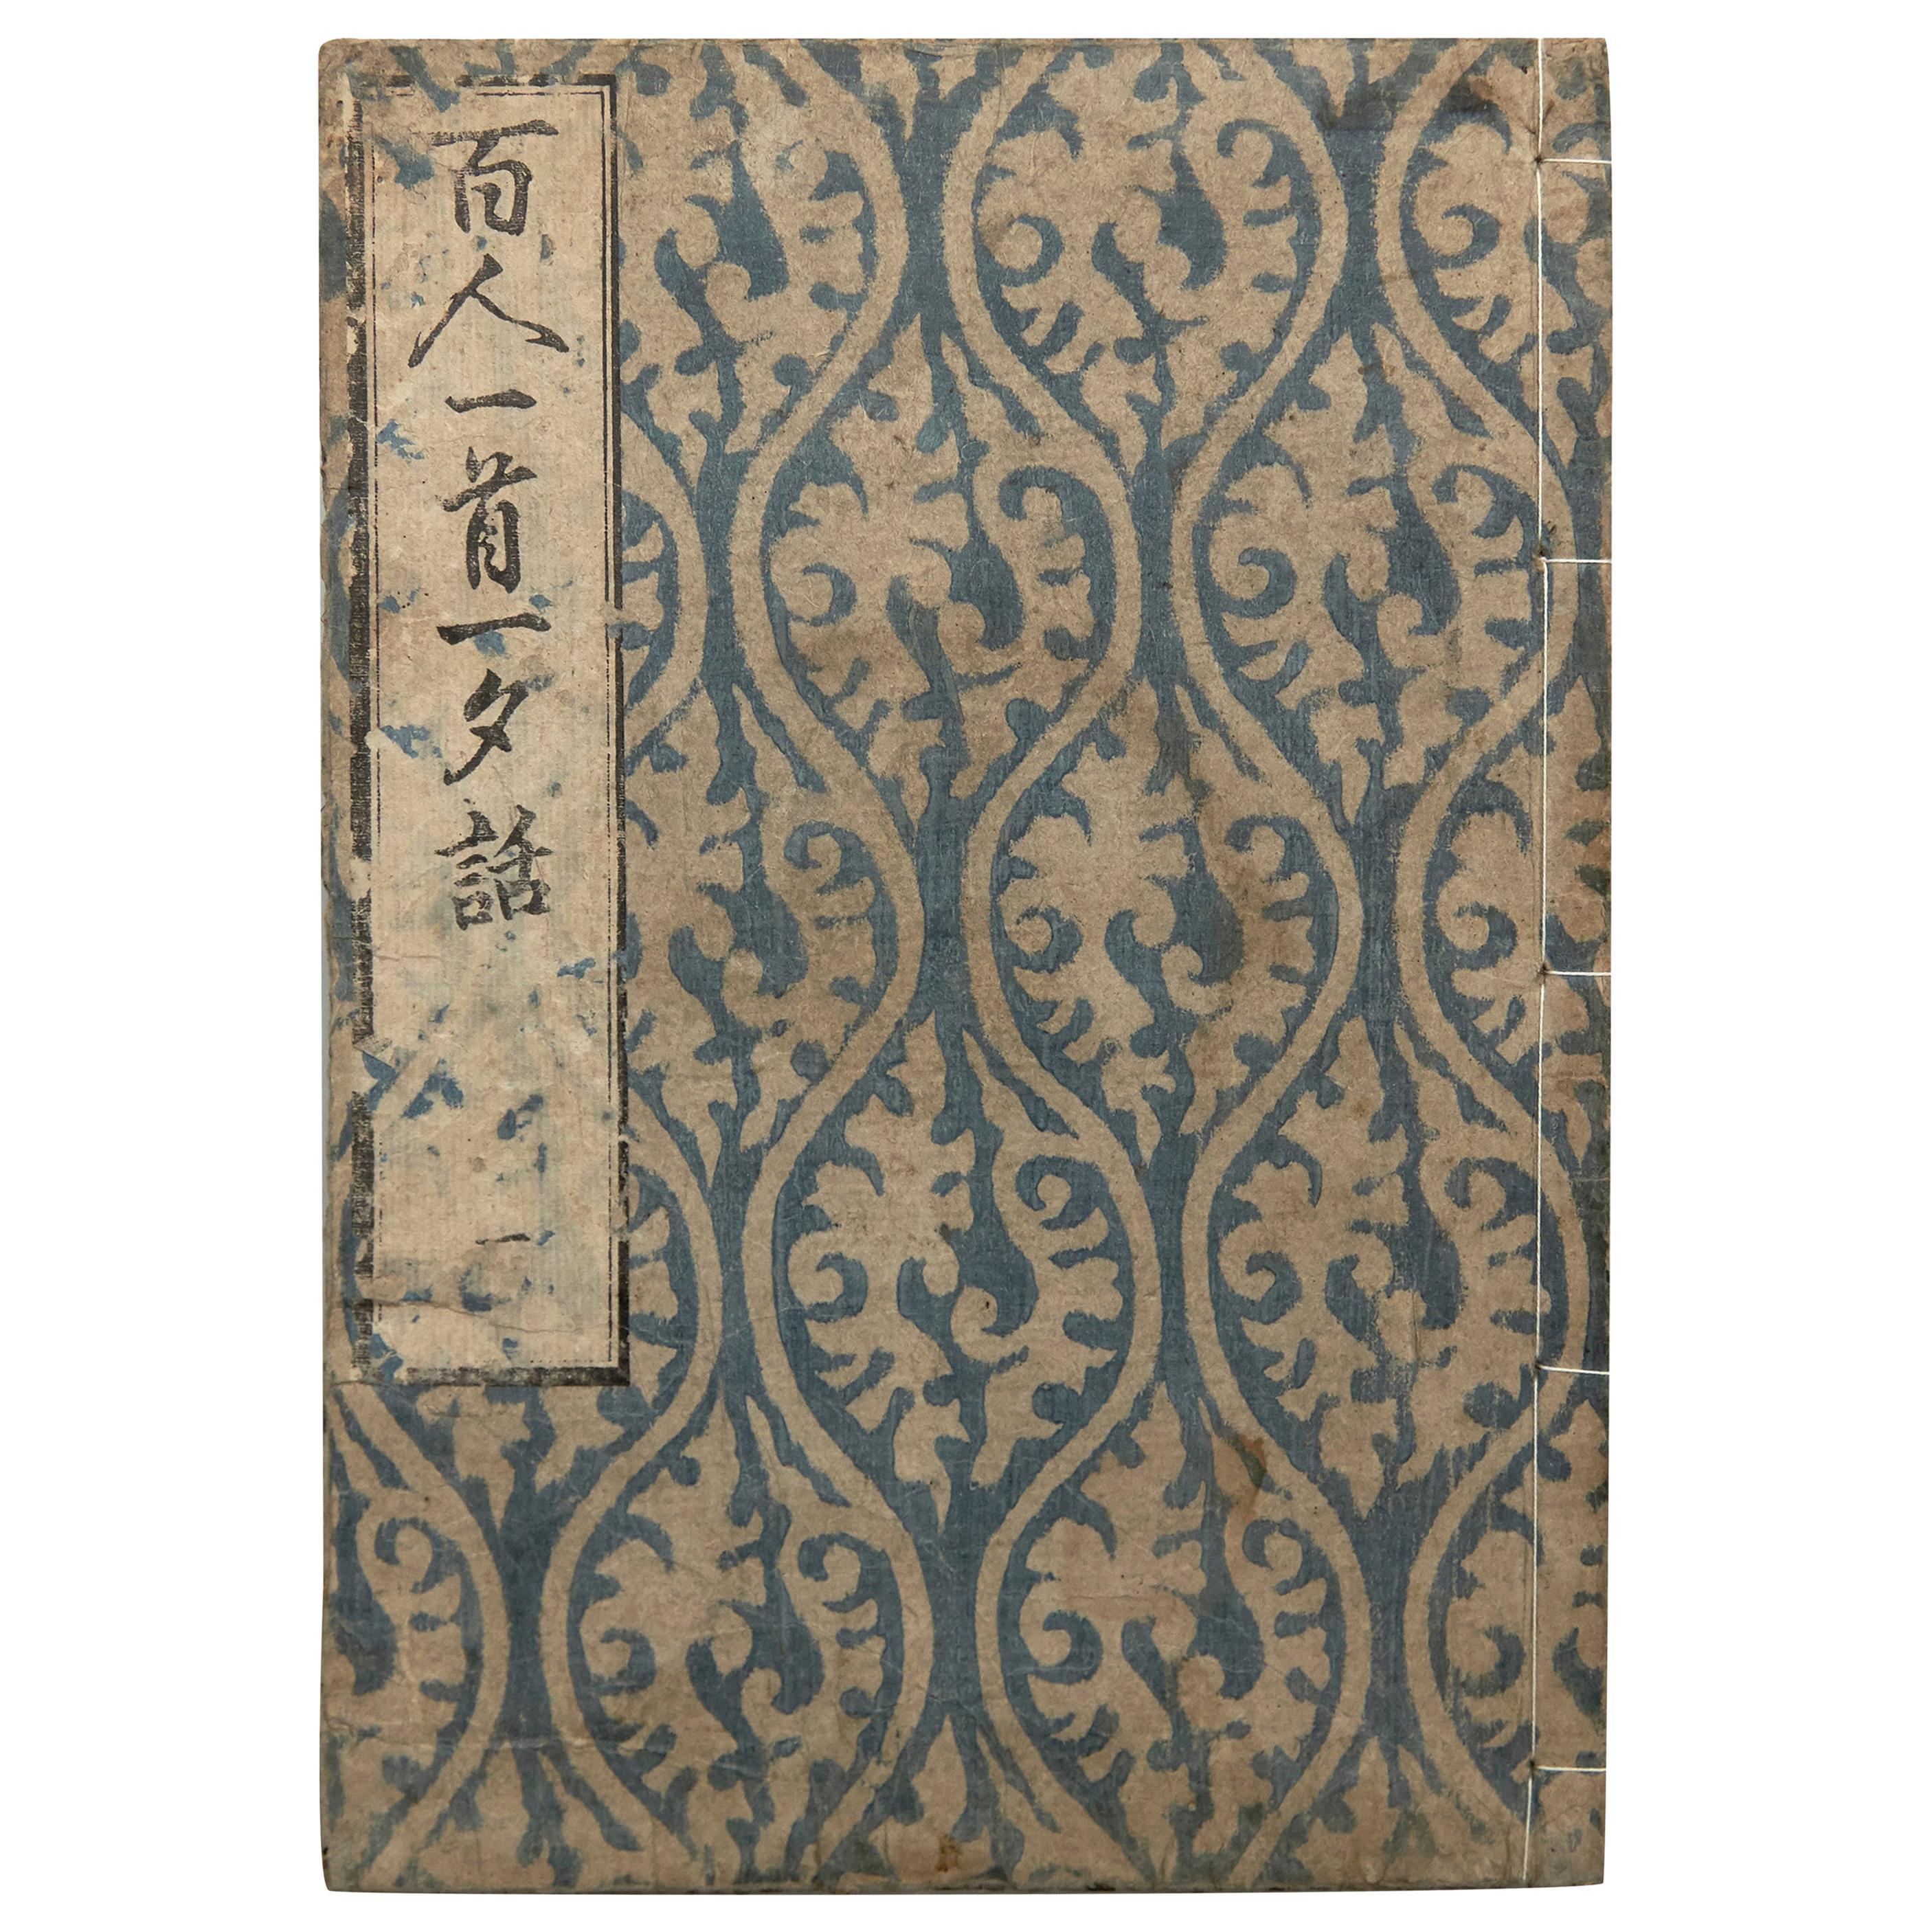 Antique Japanese Woodblock Print Book Edo Period, circa 1833